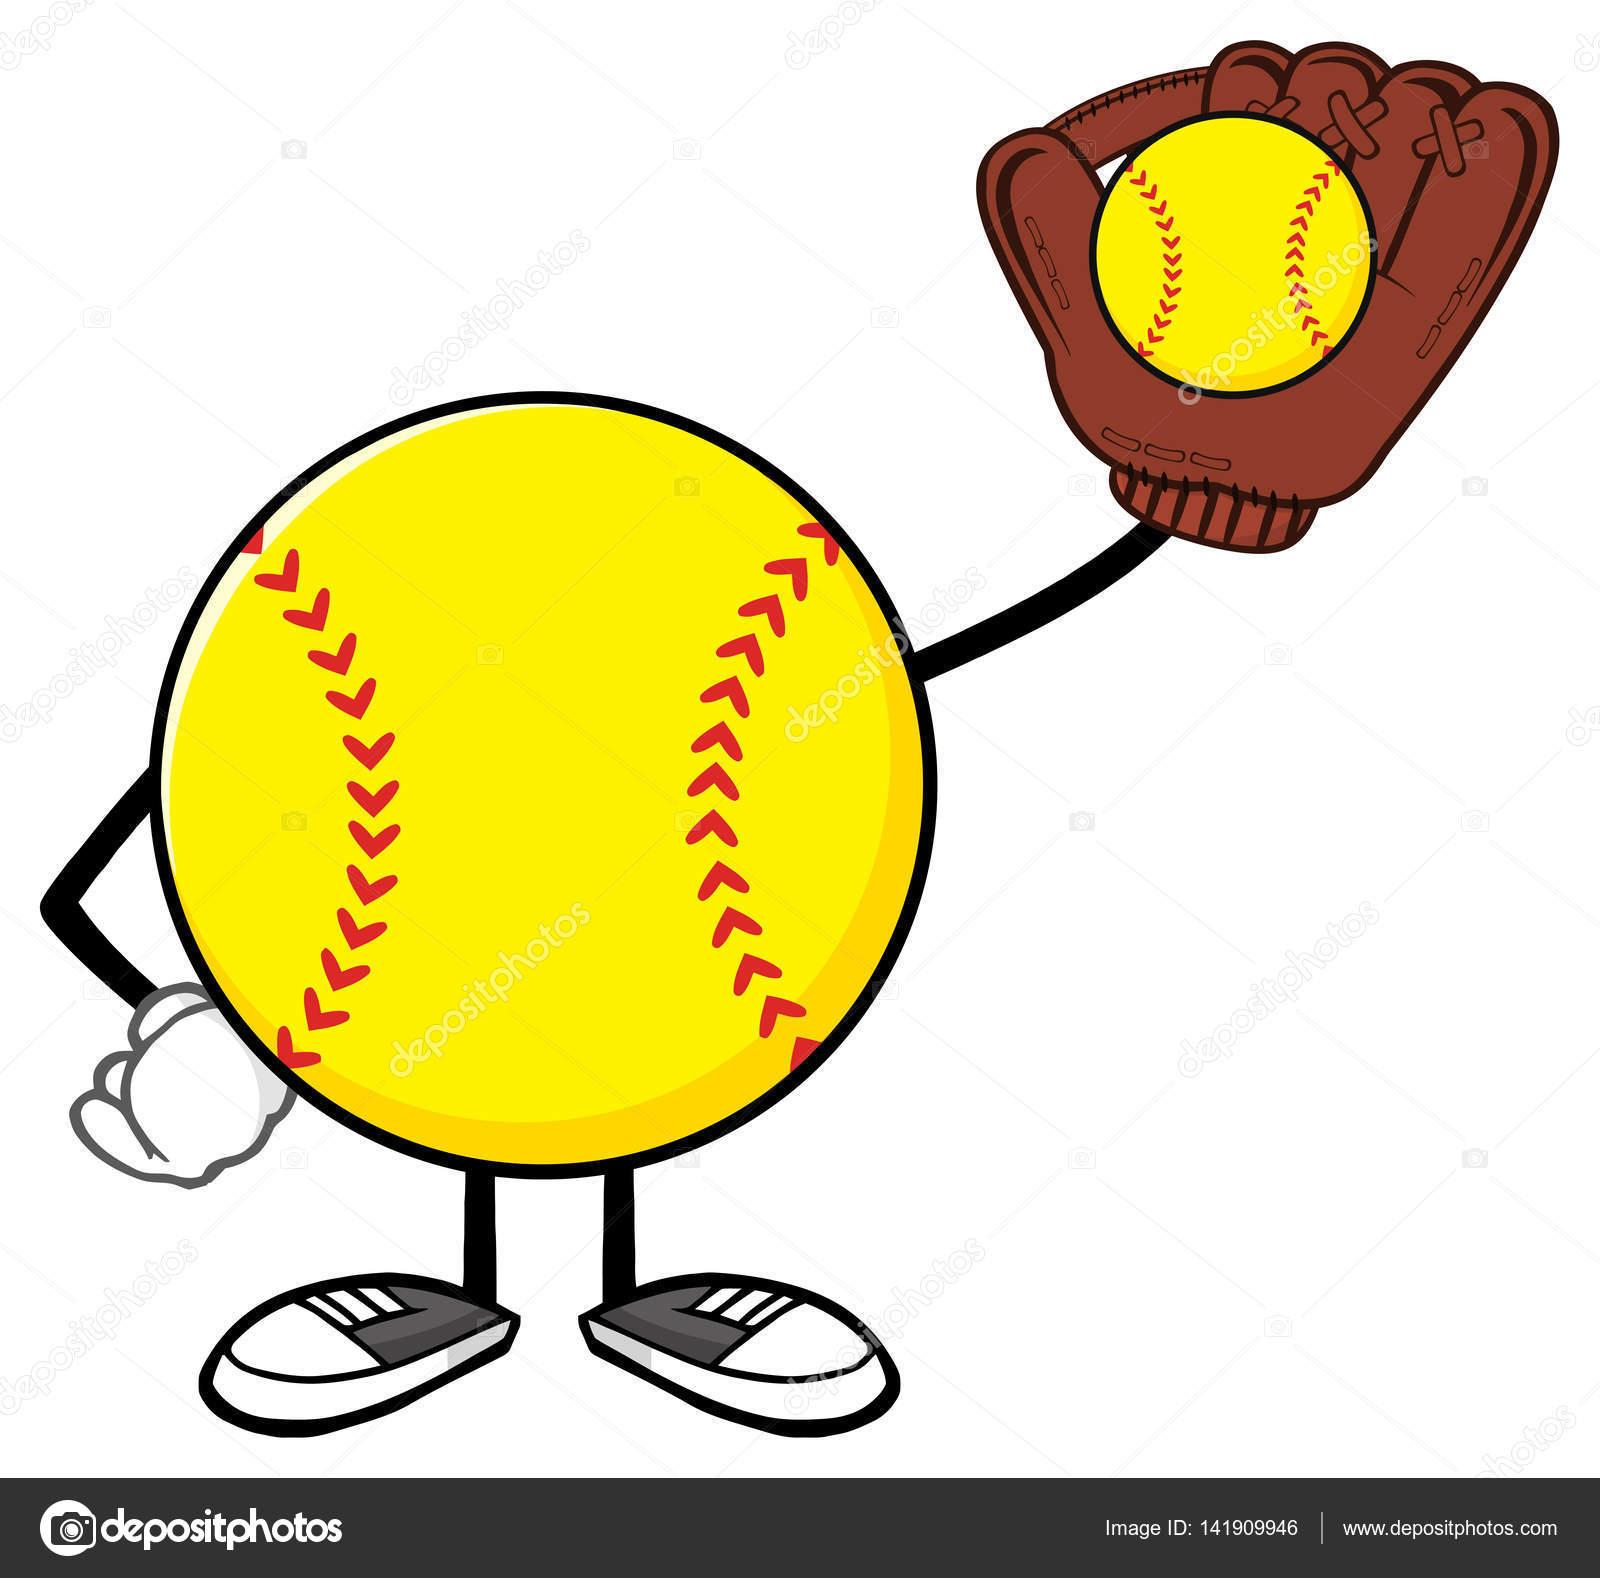 Softball player cartoon